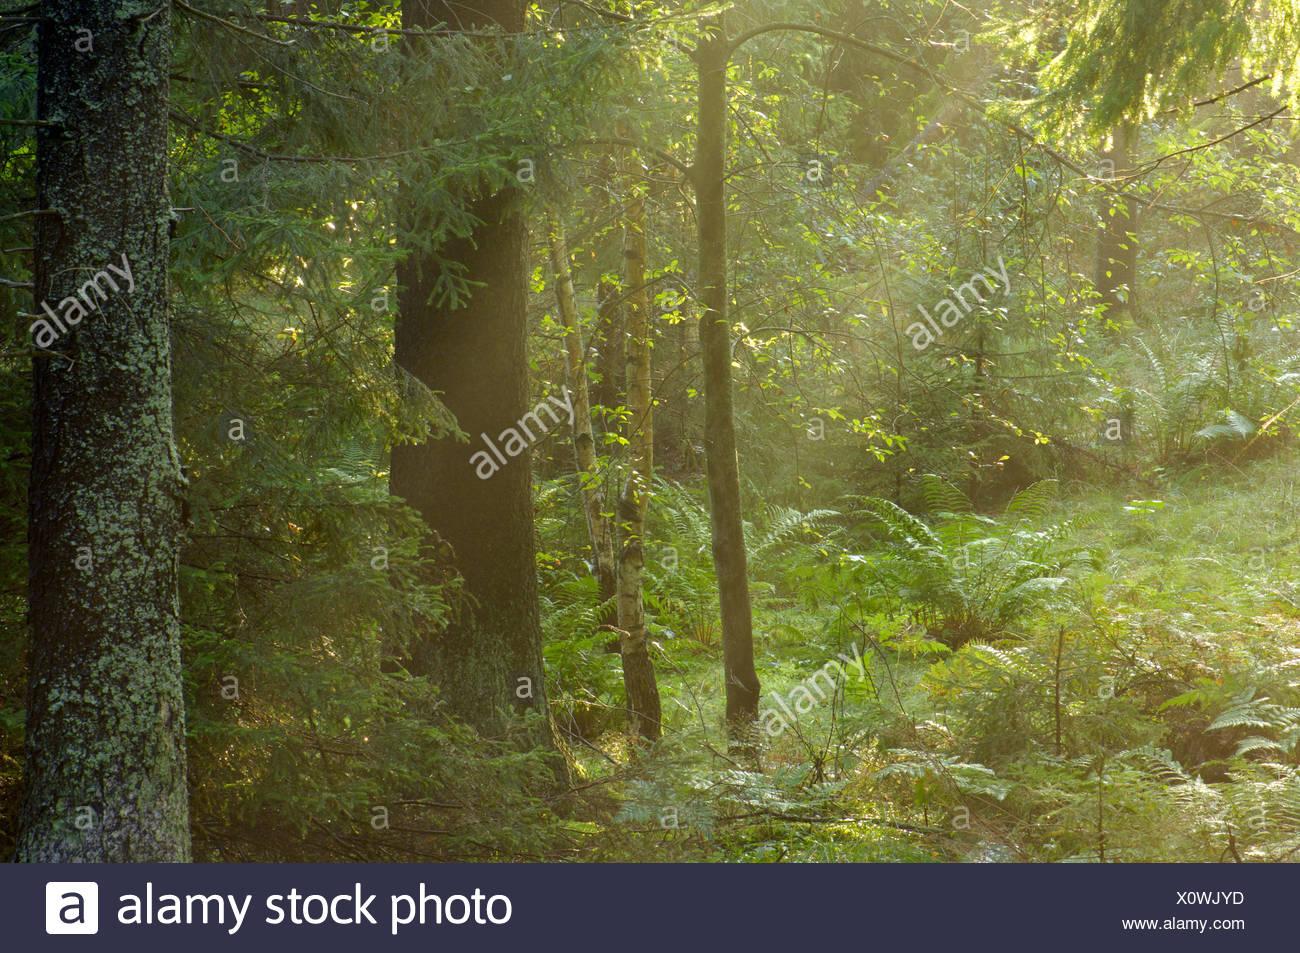 Spruce forest Ekero Sweden - Stock Image